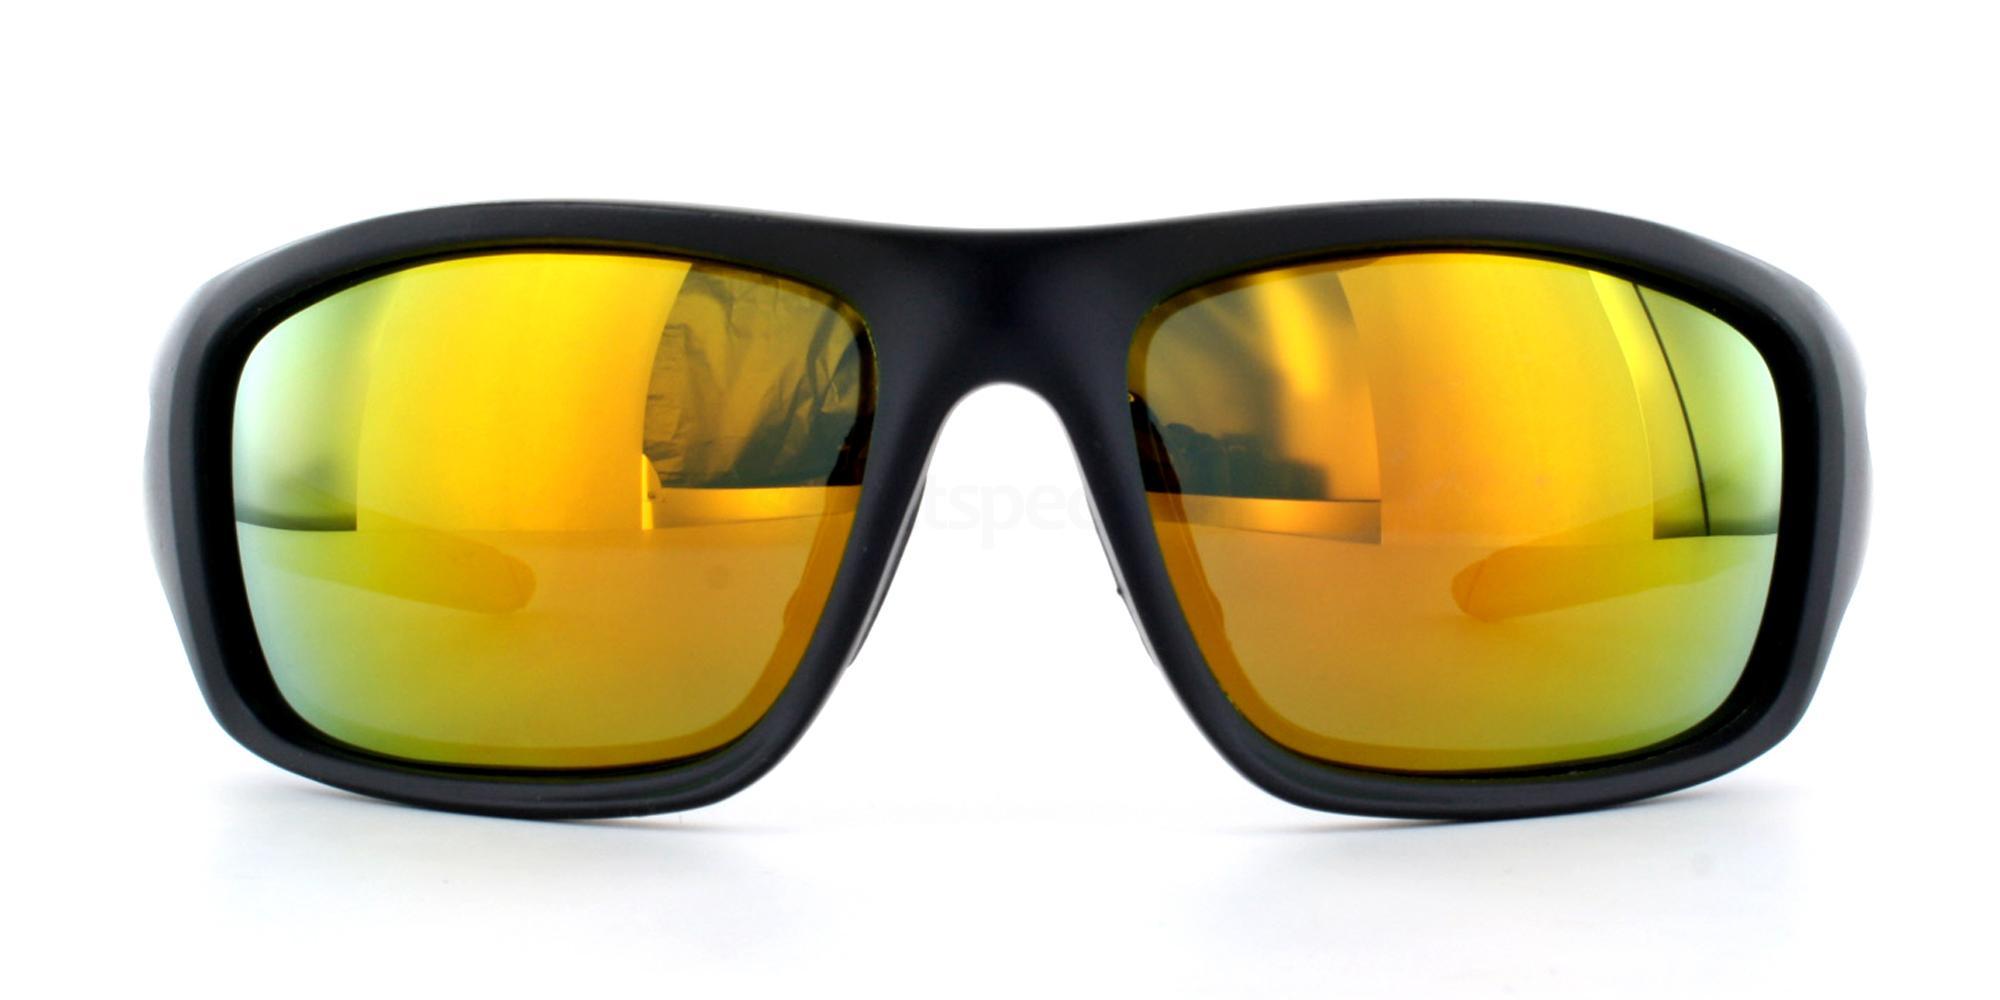 Matte Black + Revo Red Lens P5009 Sunglasses, Aero